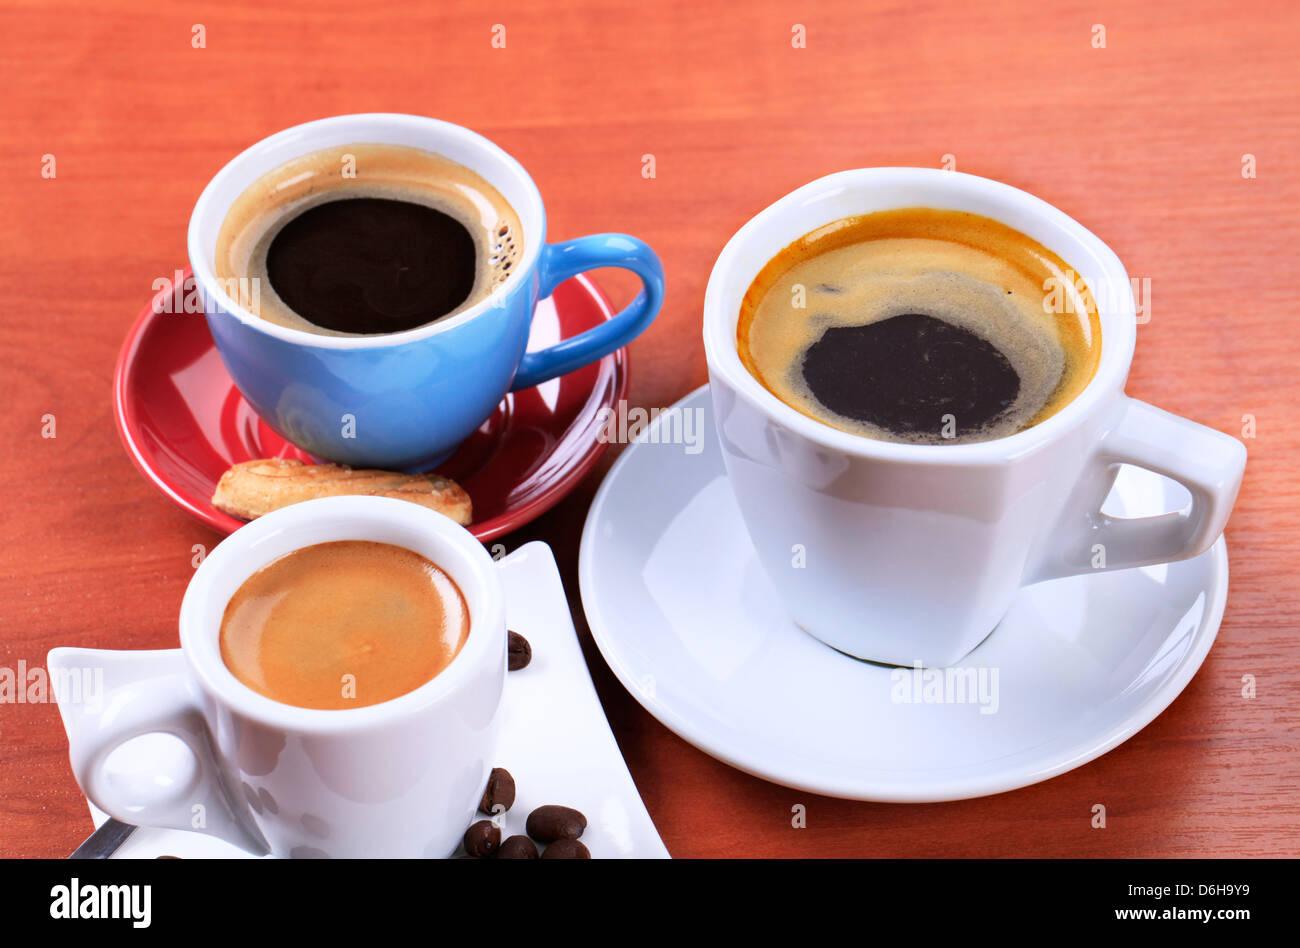 Tre tazze di caffè Immagini Stock